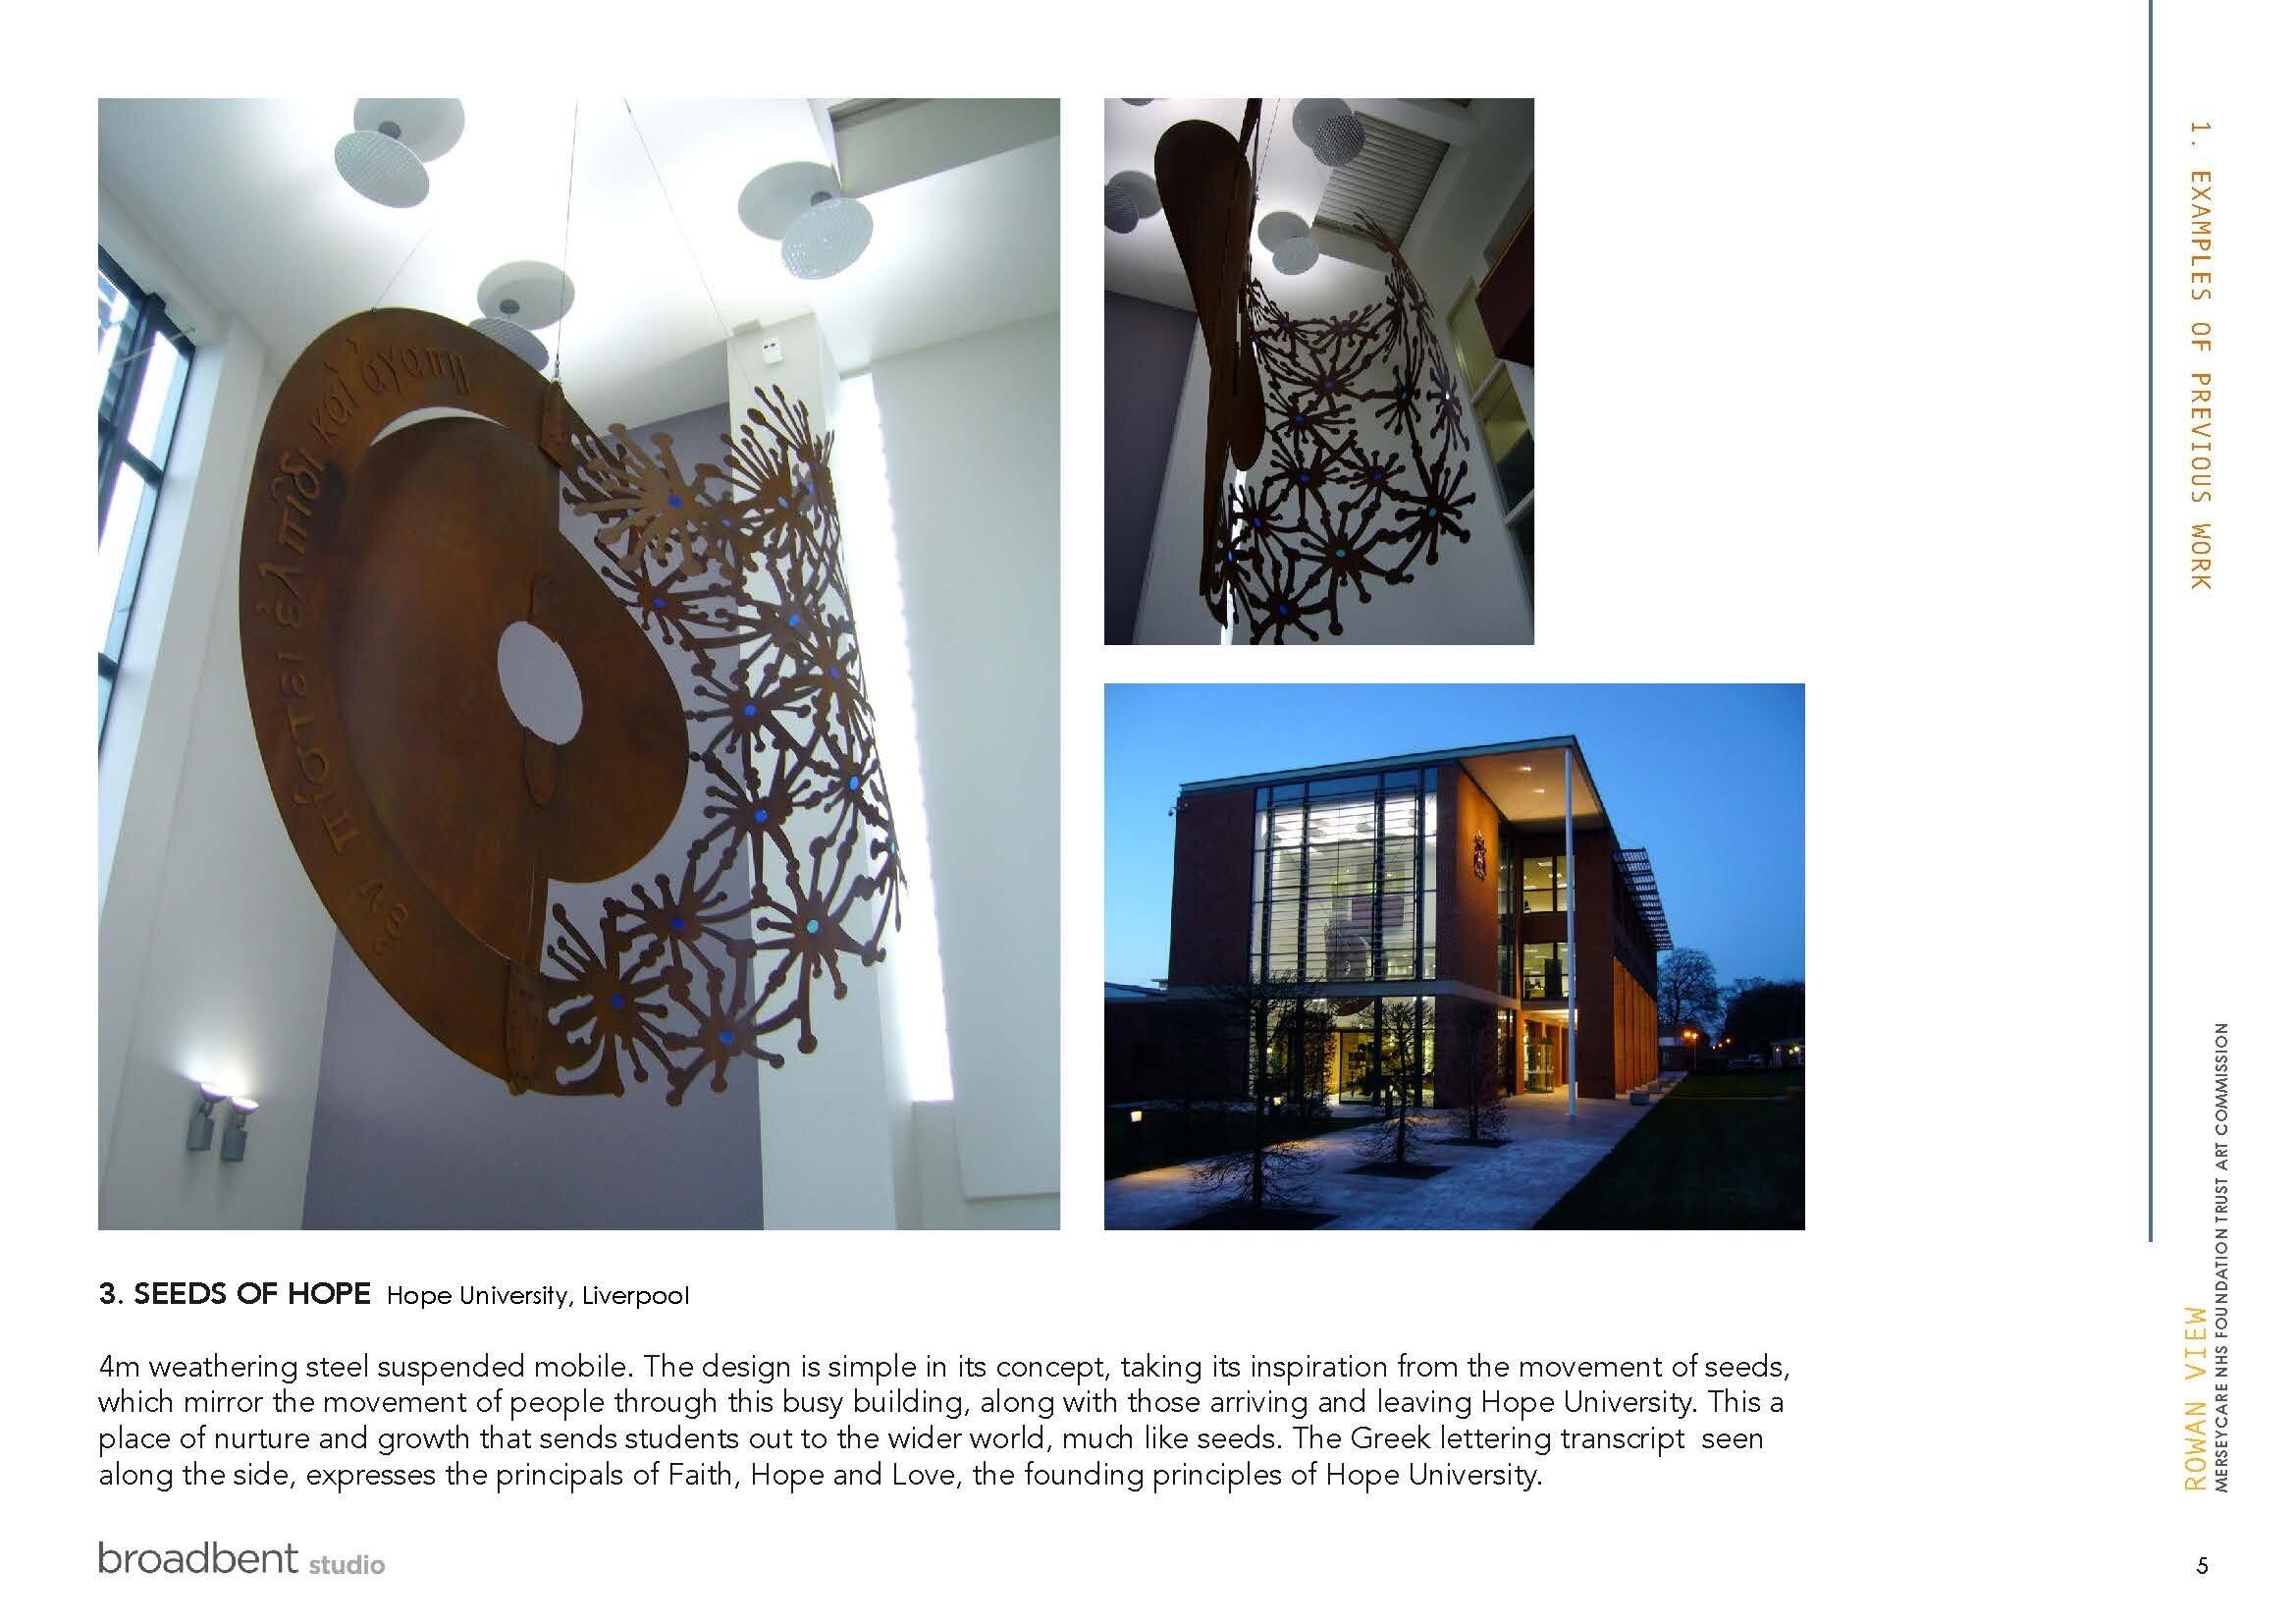 Broadbent Studio - Image 3.jpg